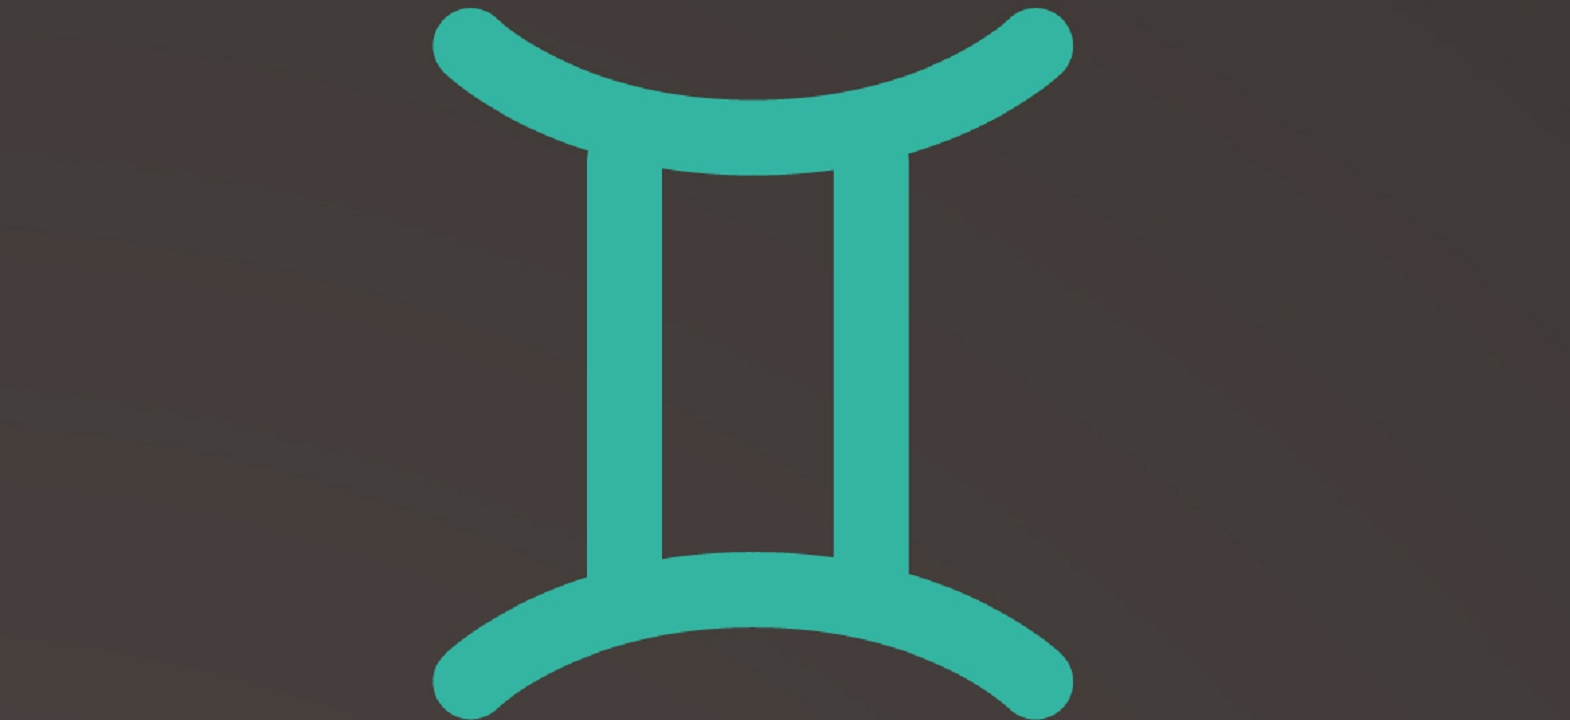 Horoscop Minerva săptămâna 13 - 19 Iulie - GEMENI